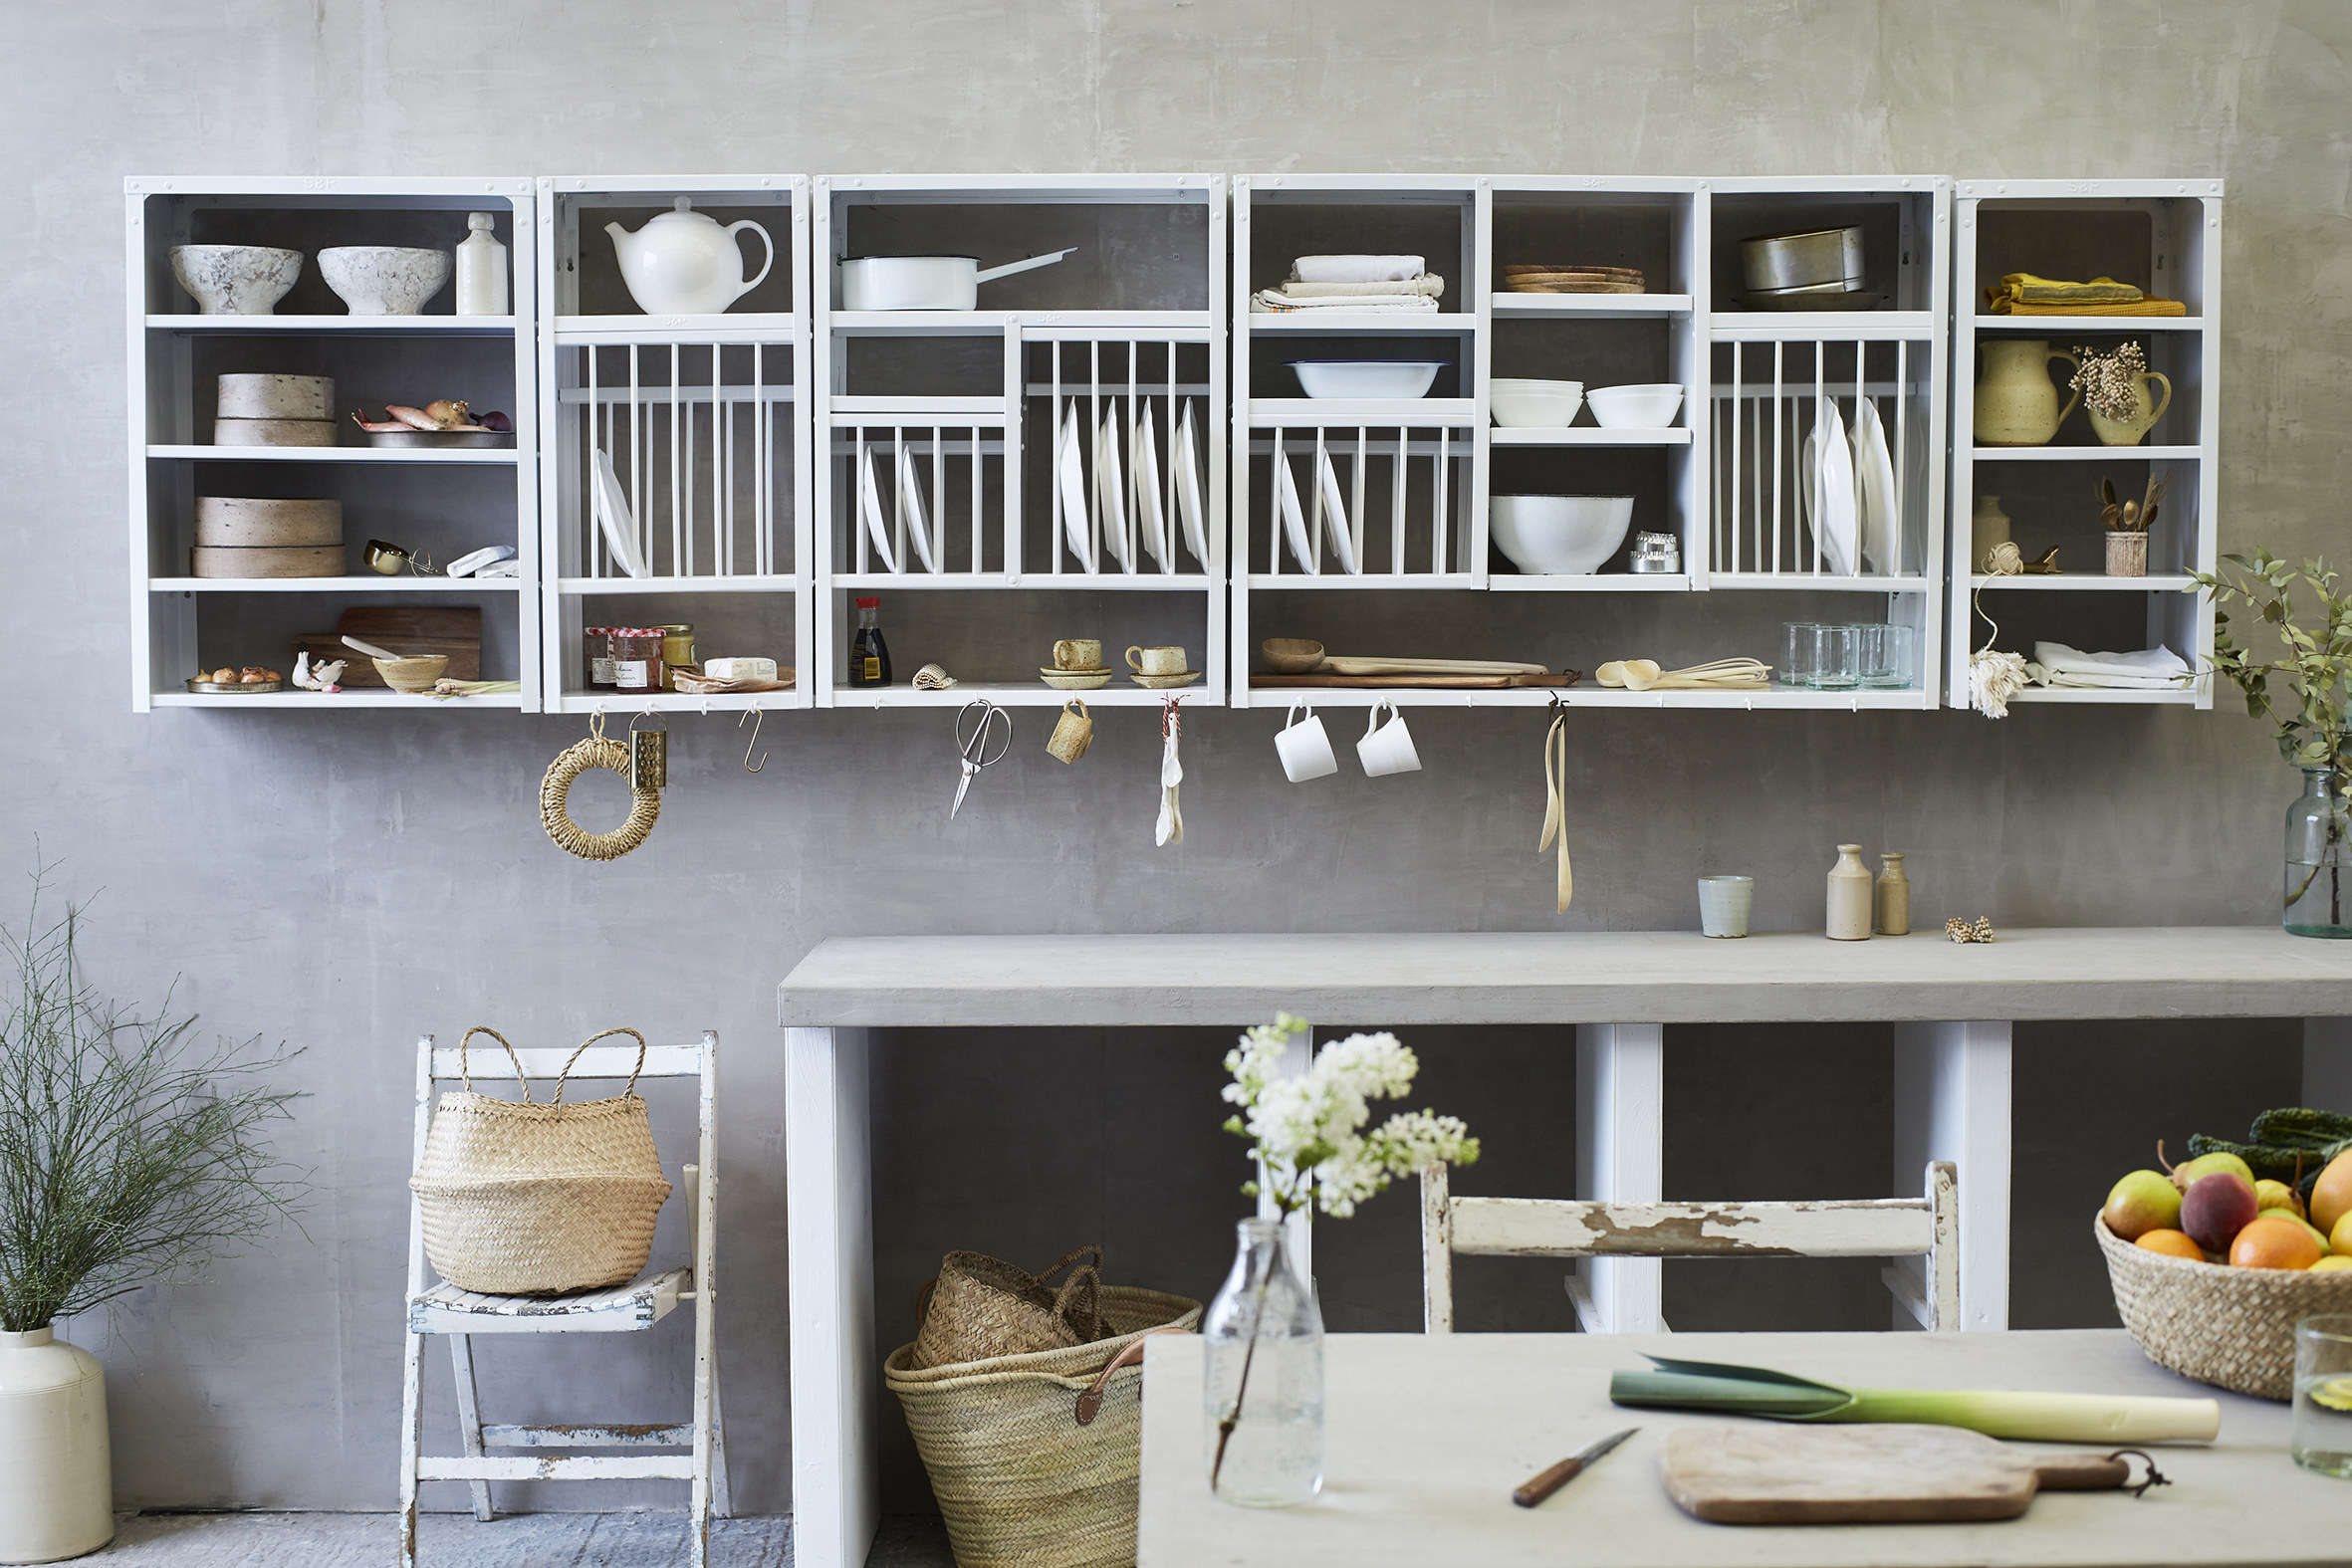 Superbe The Organized Home